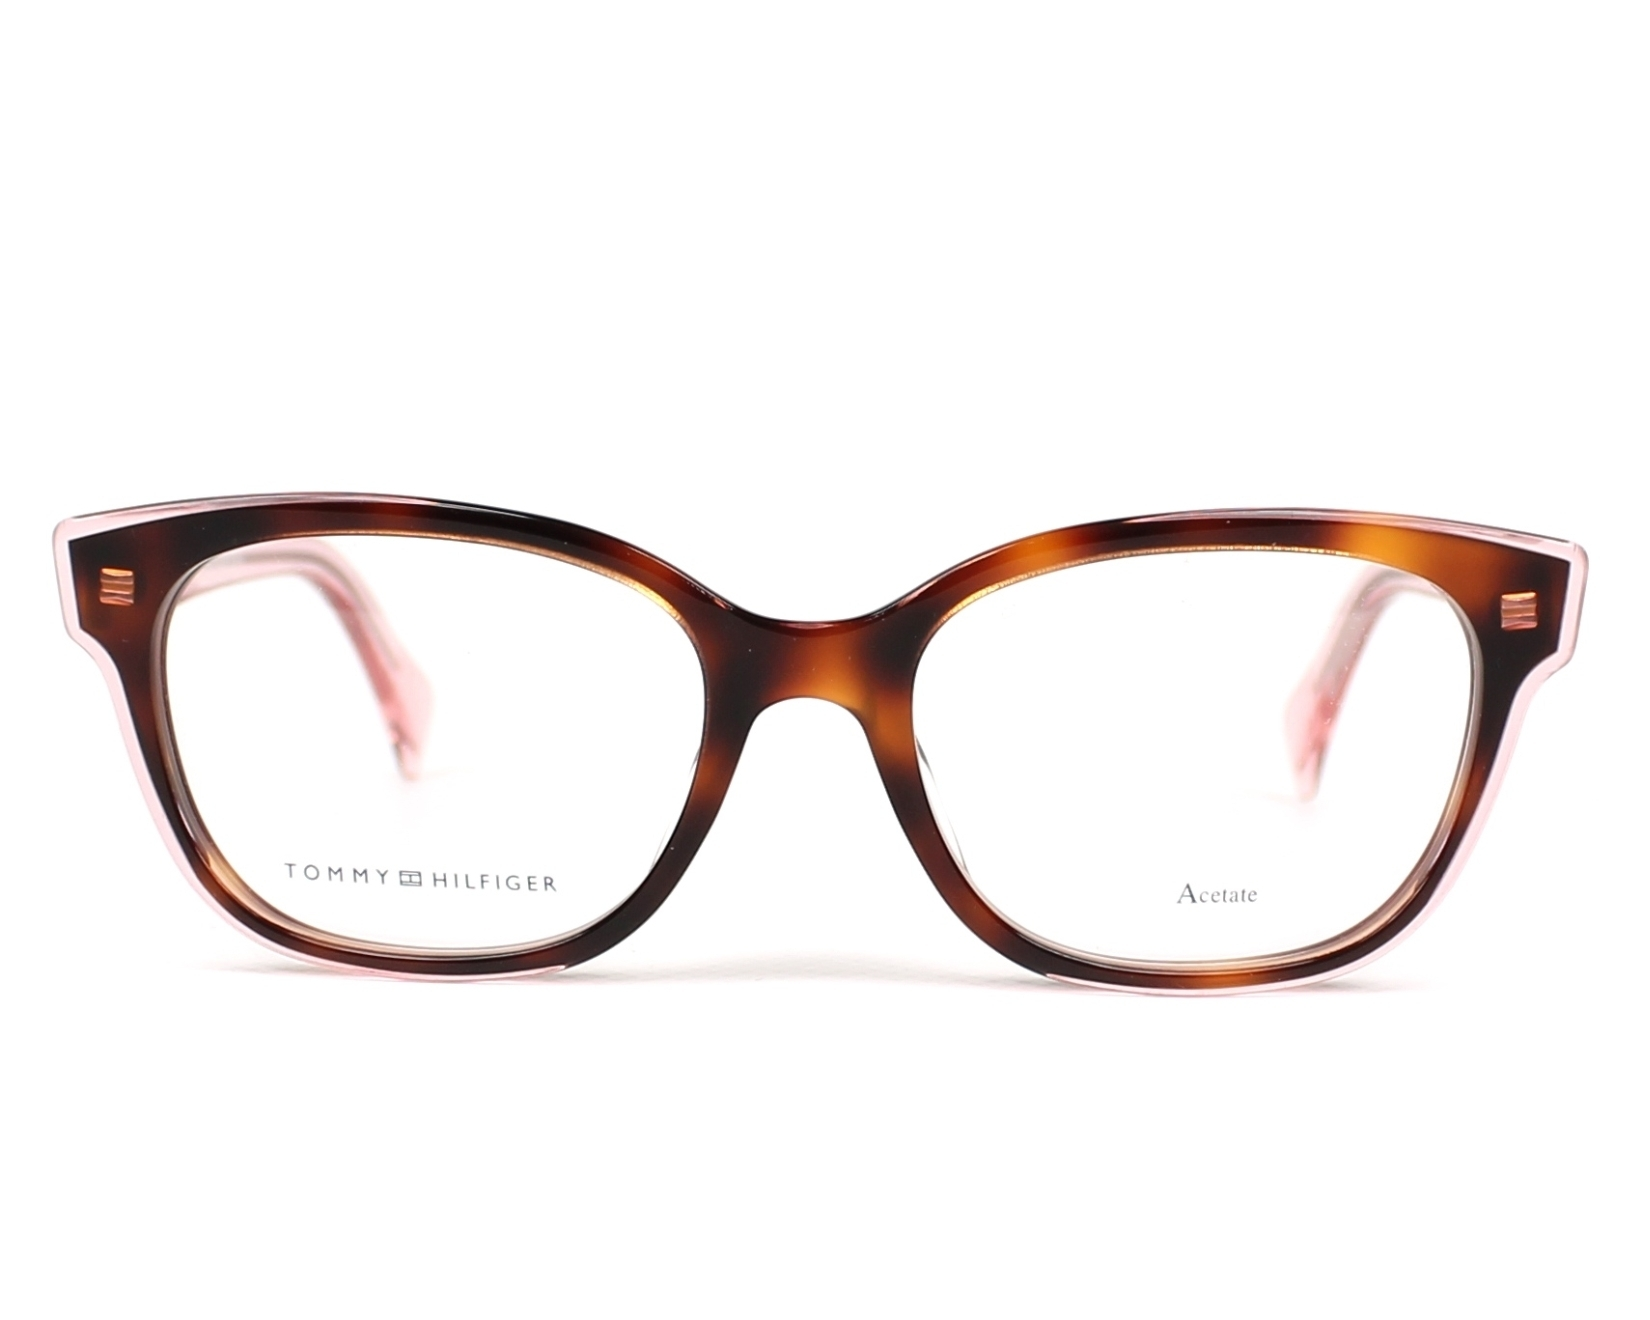 achat lunettes de vue tommy hilfiger th 1439 lq8 visionet. Black Bedroom Furniture Sets. Home Design Ideas